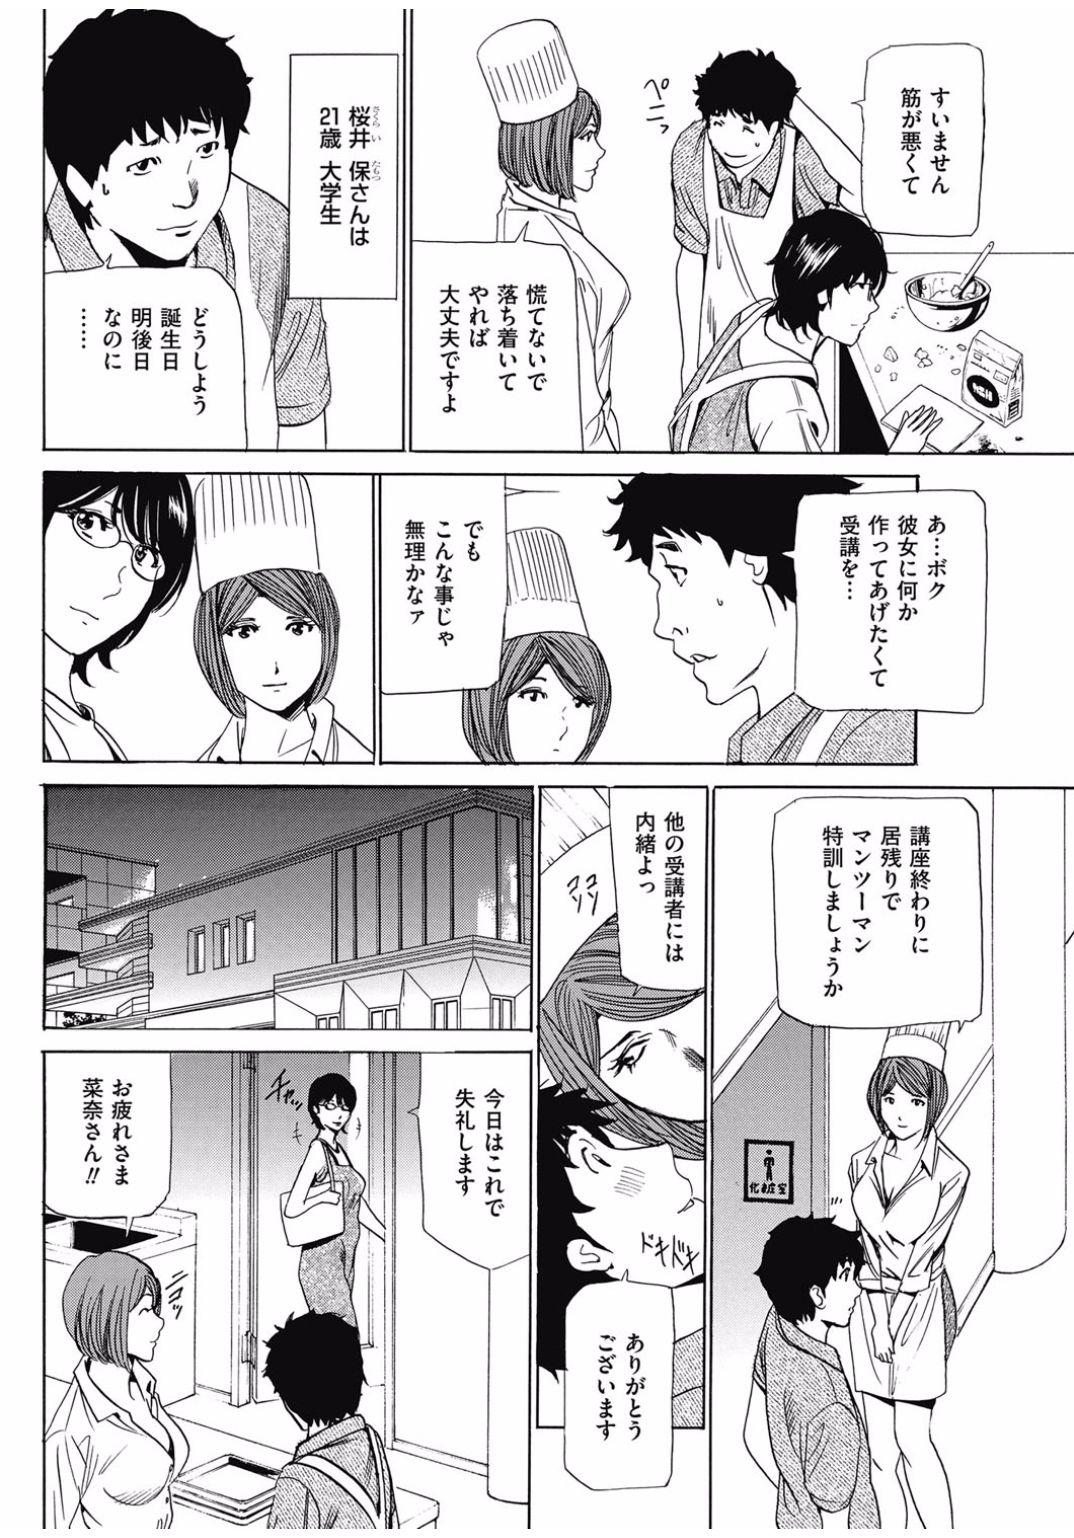 Wa Usuki Ipa a 1-10 78